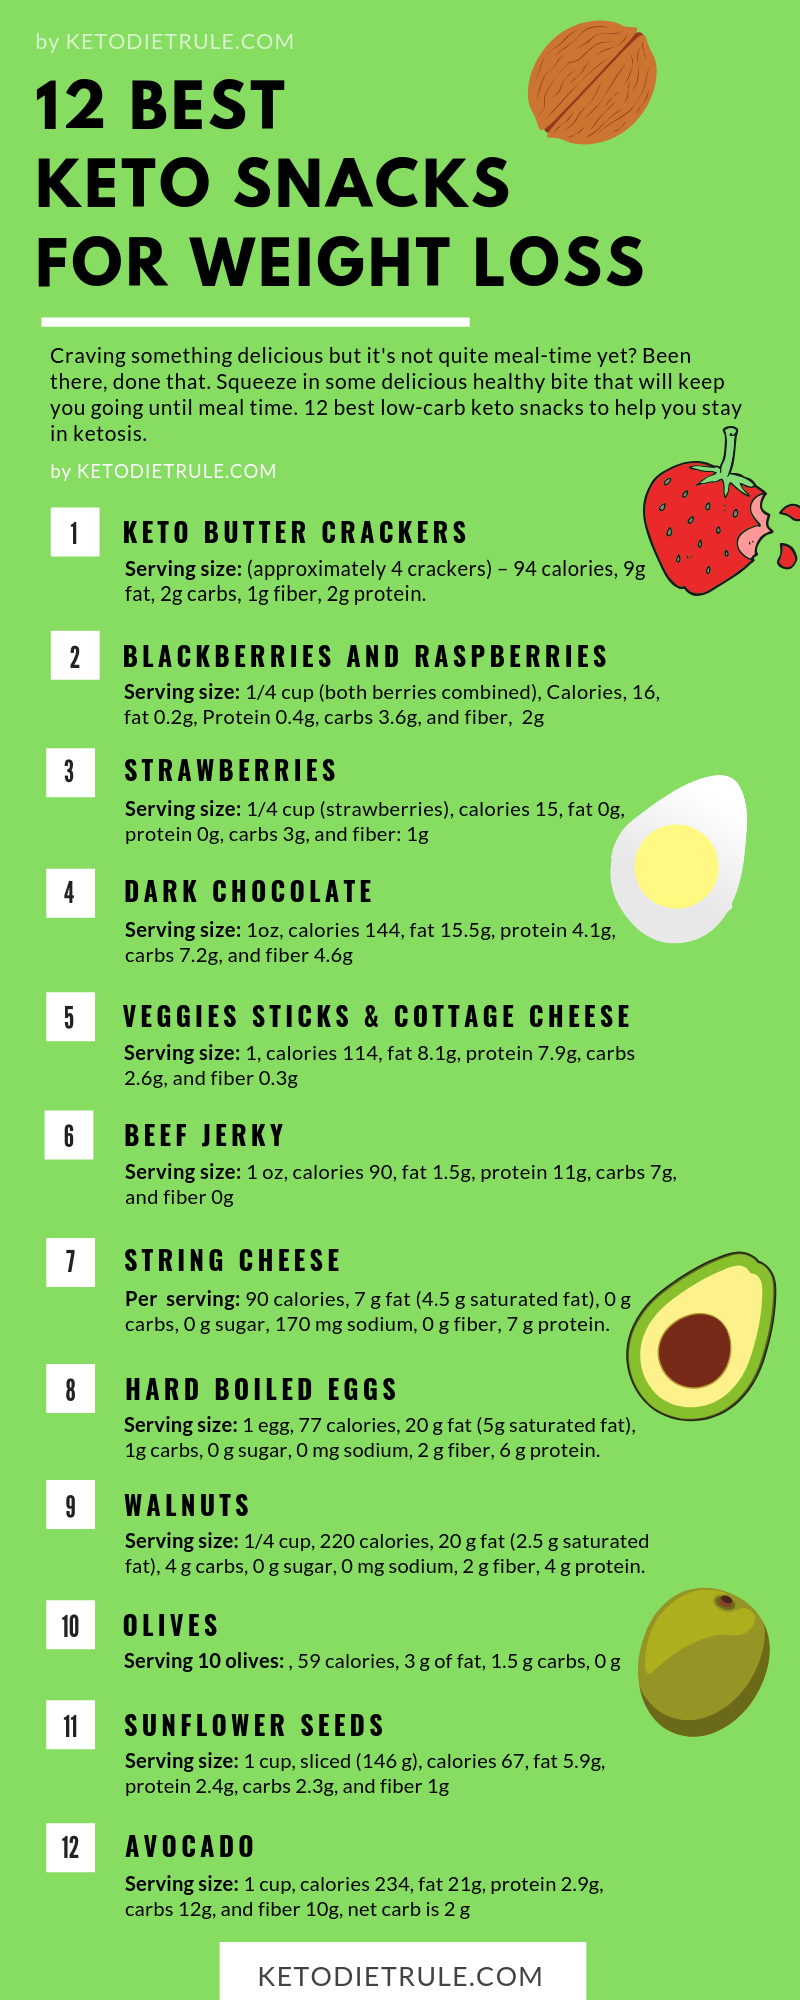 Dark Chocolate Coconut Almond Keto Bars 10 Pack In 2020 Healthy Low Carb Snacks Keto Diet Ketogenic Diet Snacks